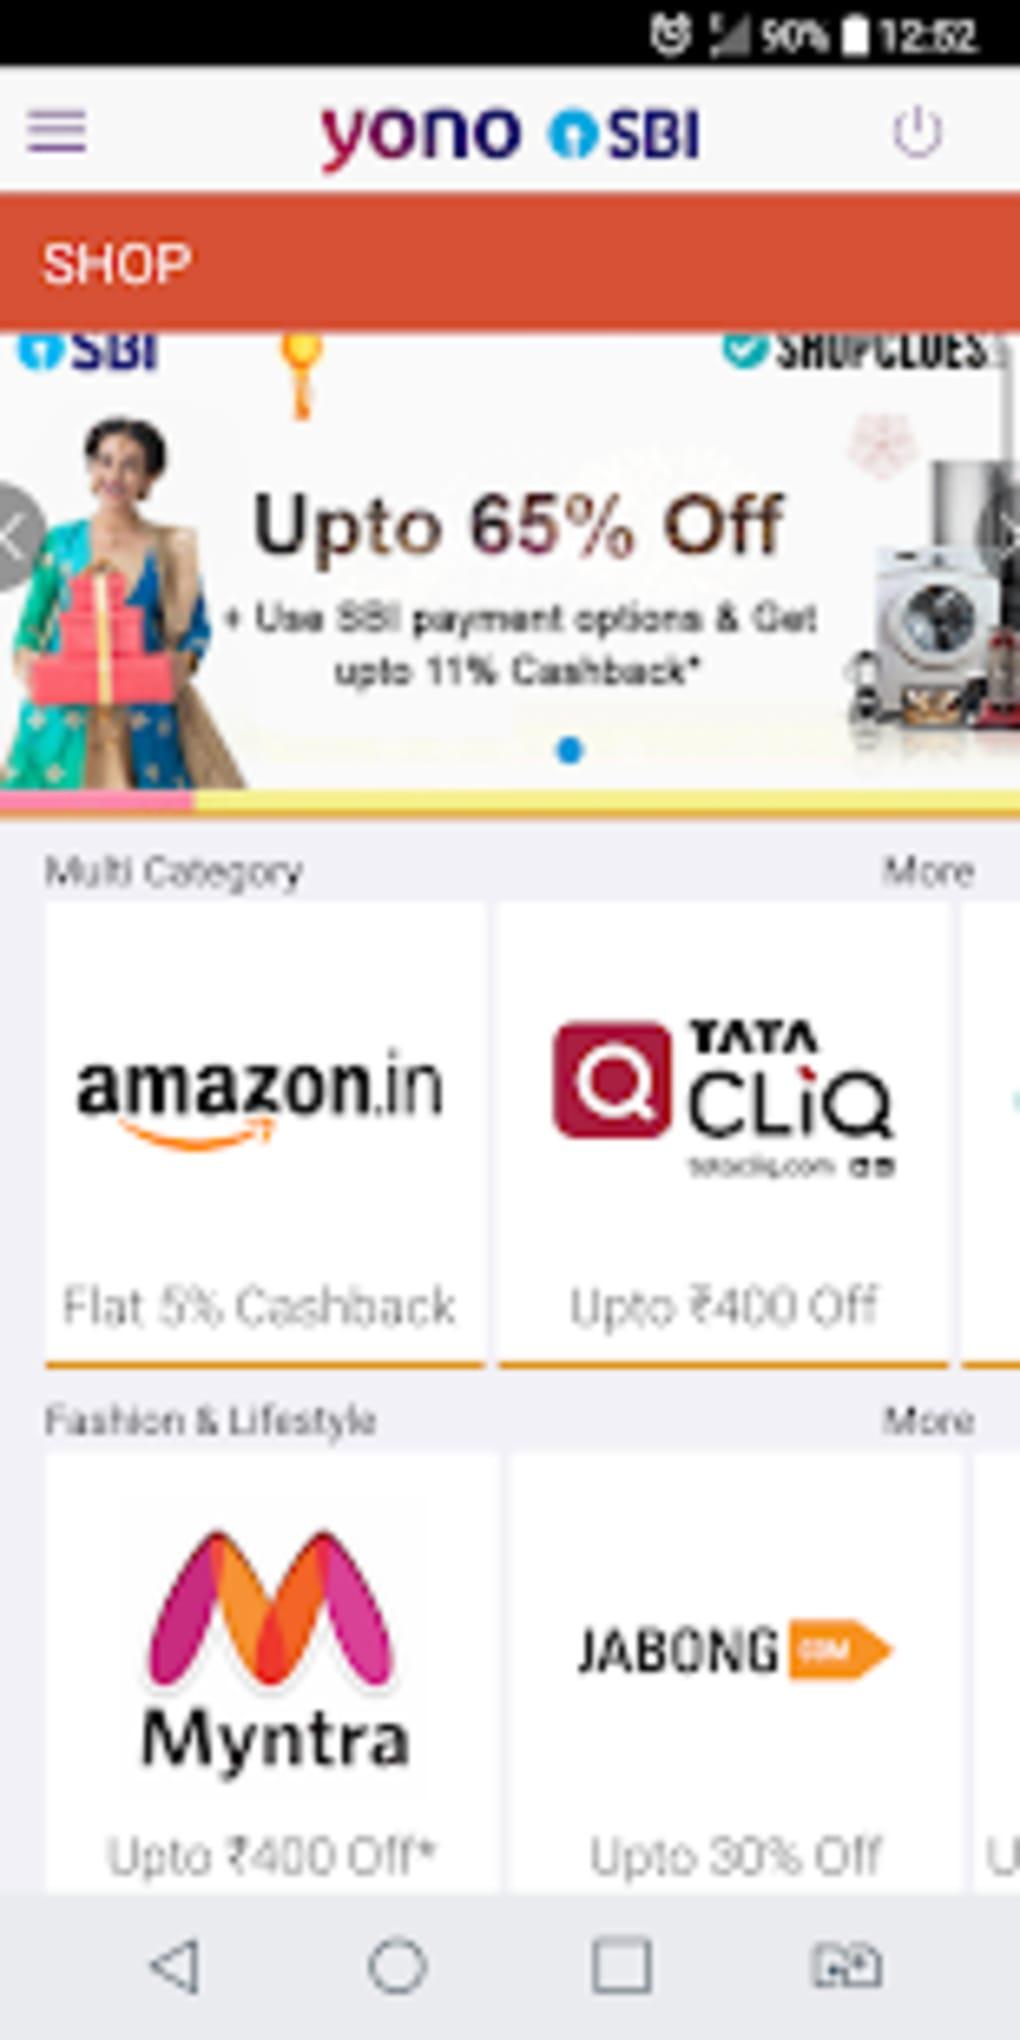 sbi online mobile app download